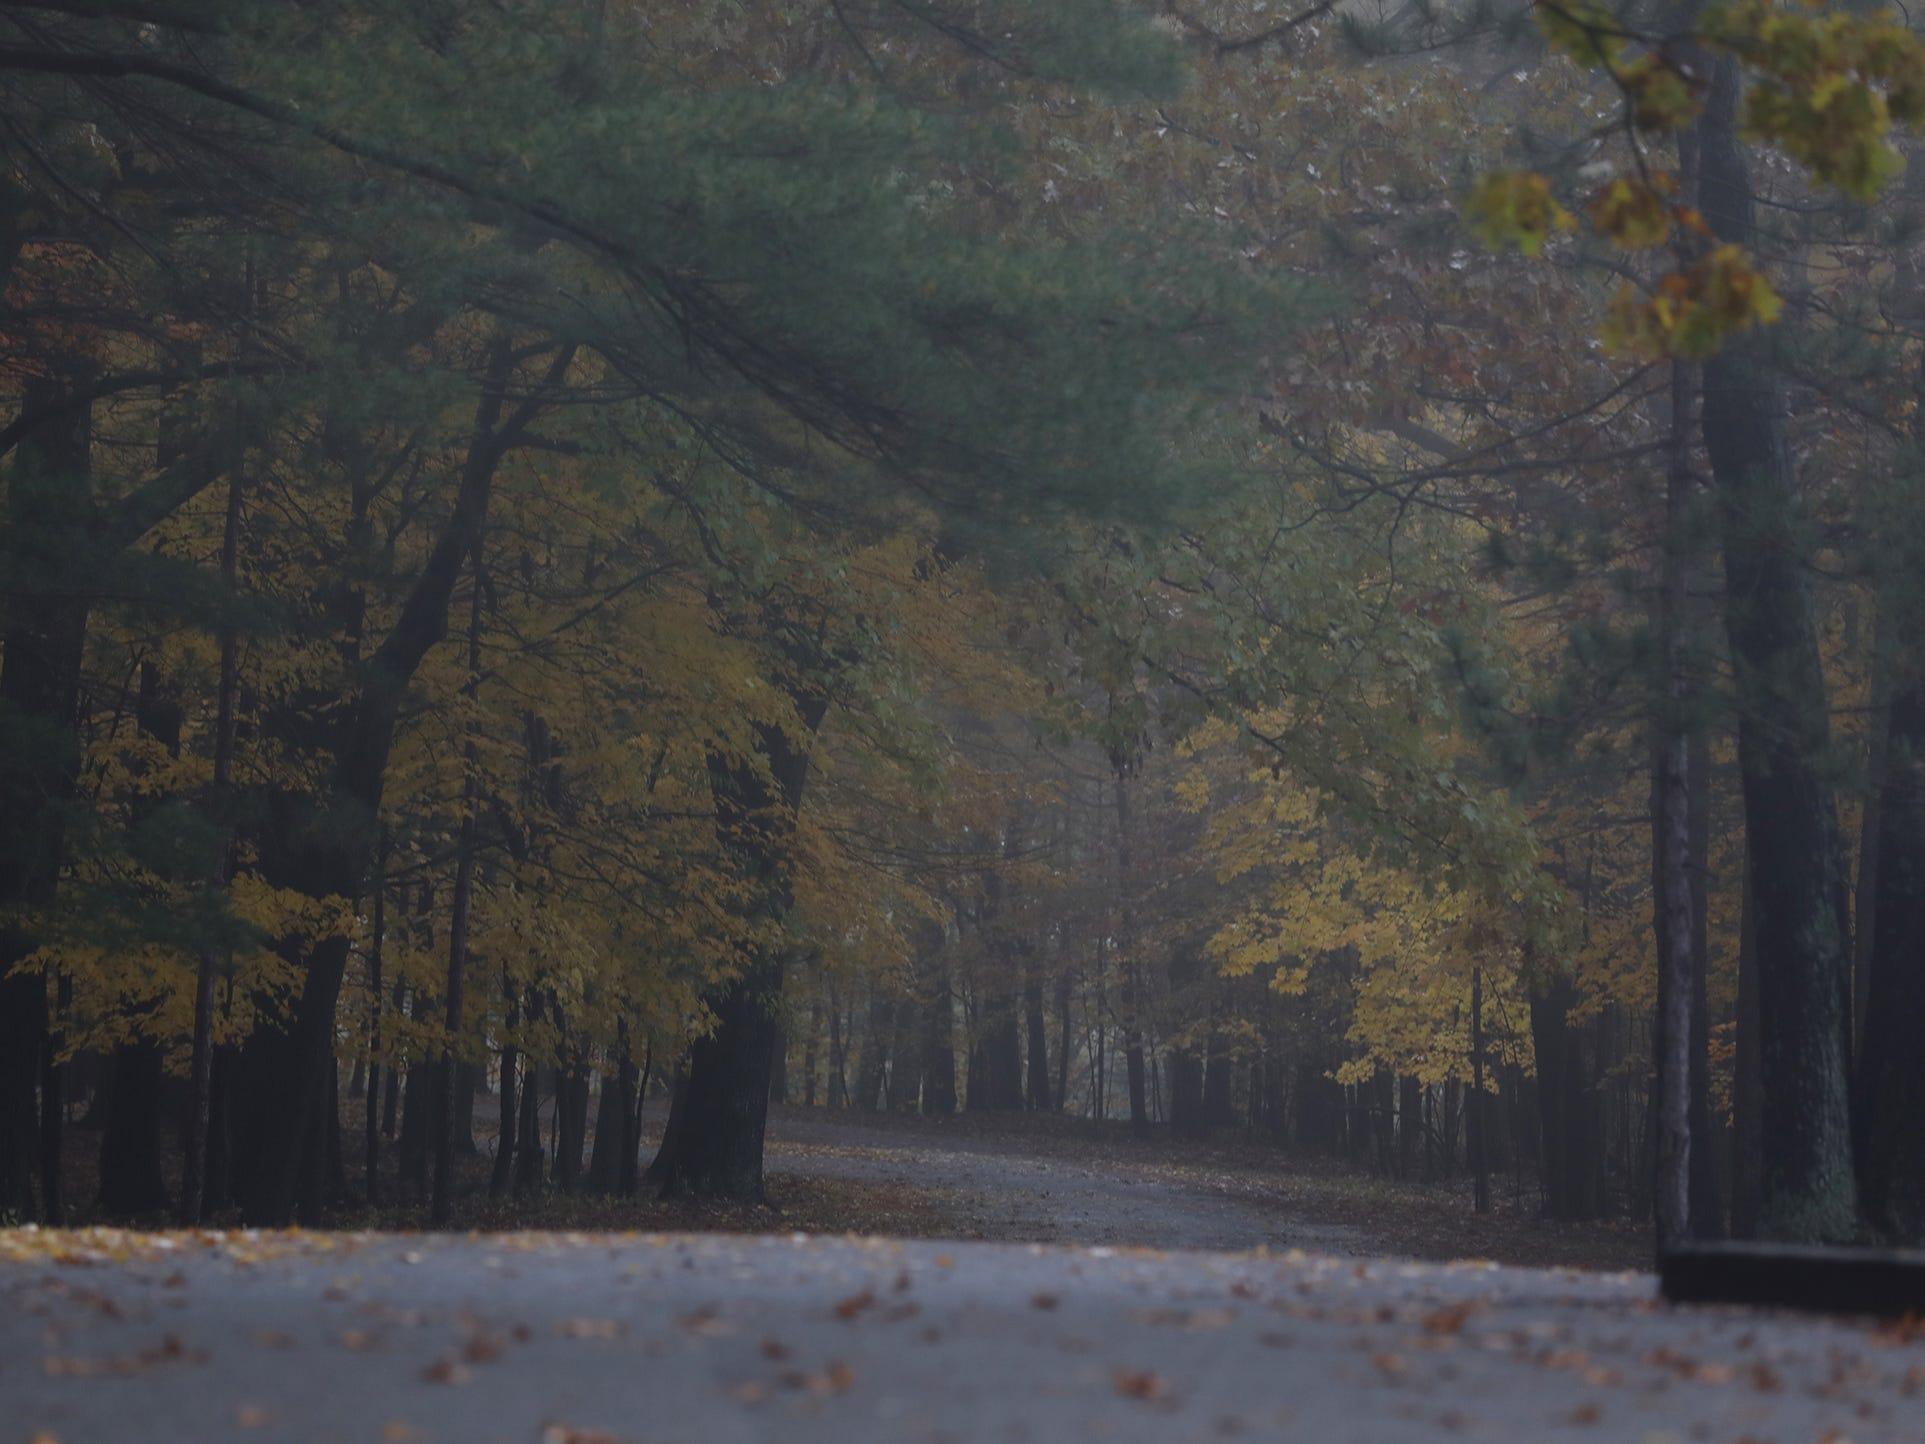 Fog makes portions of Park Rd. in Letchworth State Park darker.